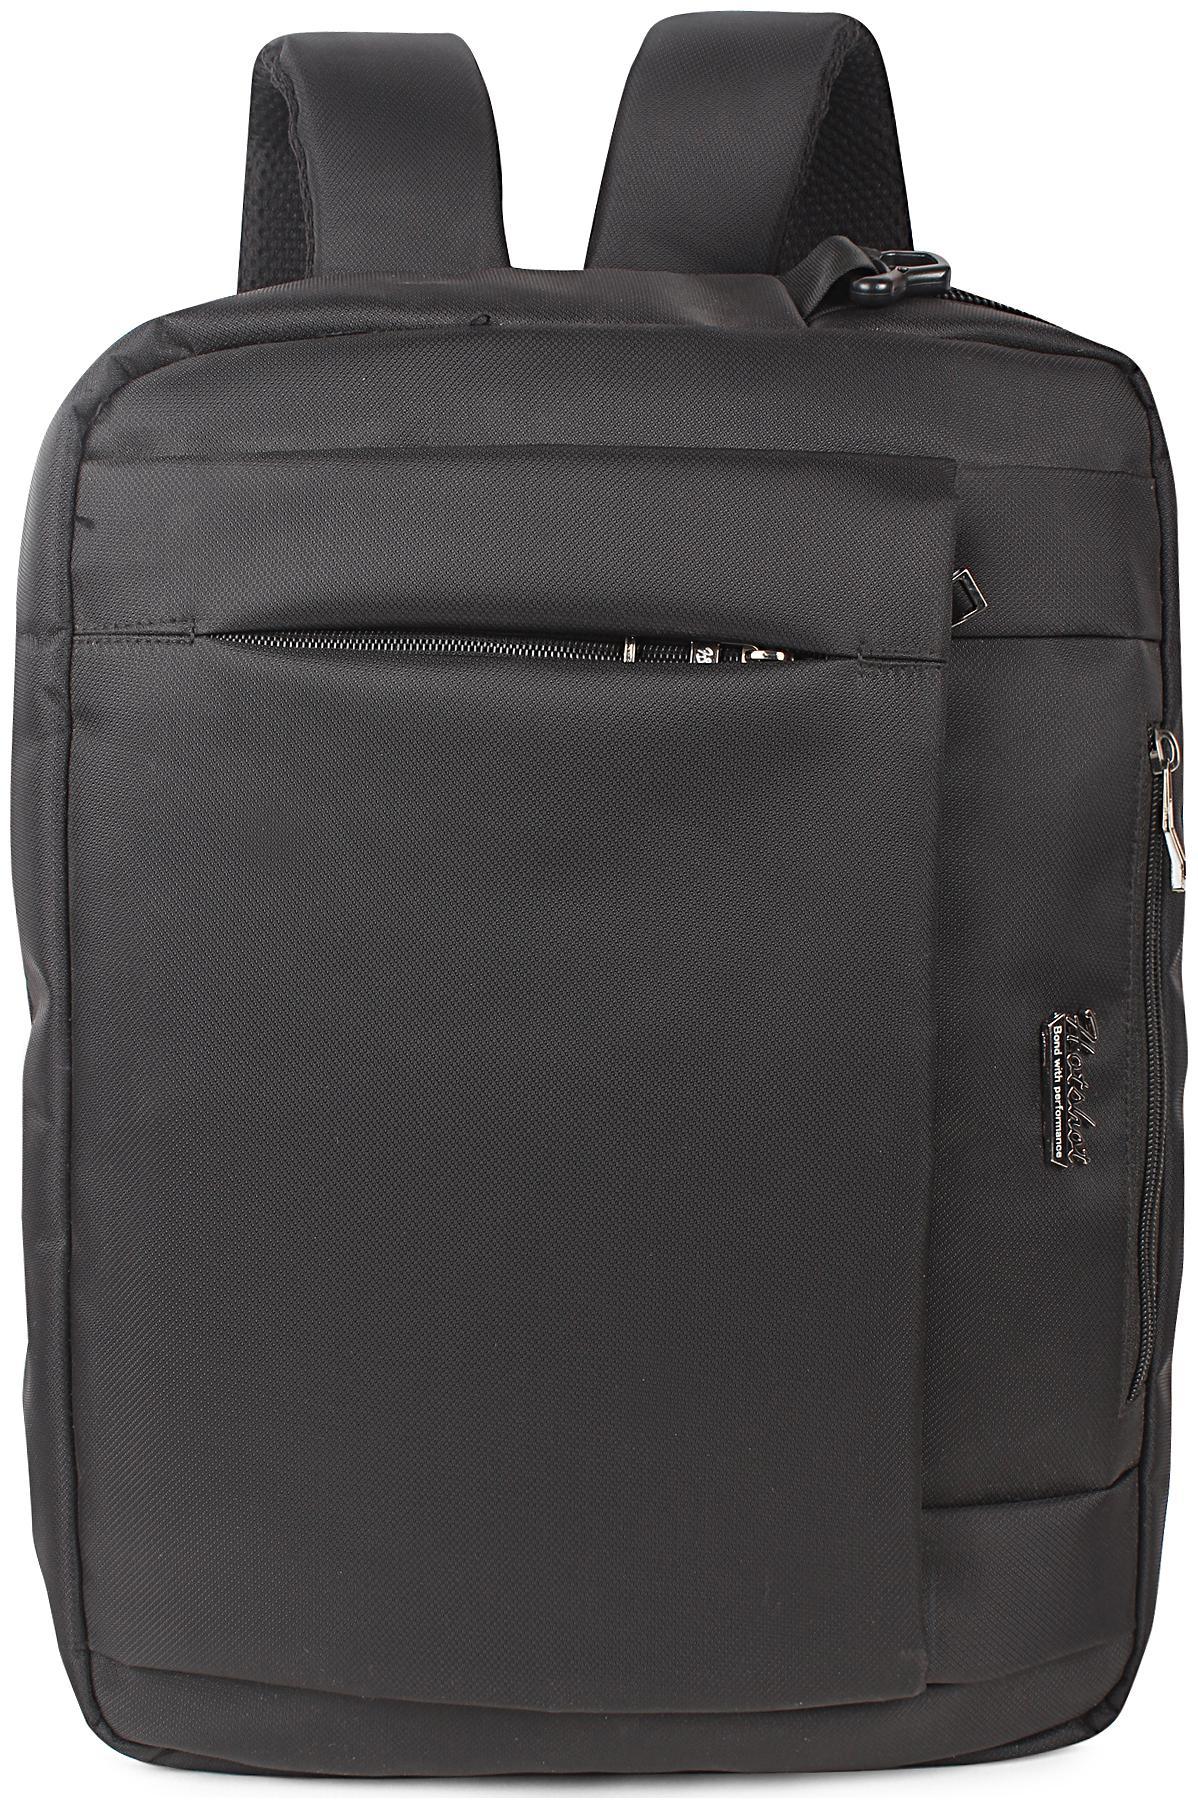 Hotshot Synthetic Polyester 15.6 inch Laptop Messenger Bag